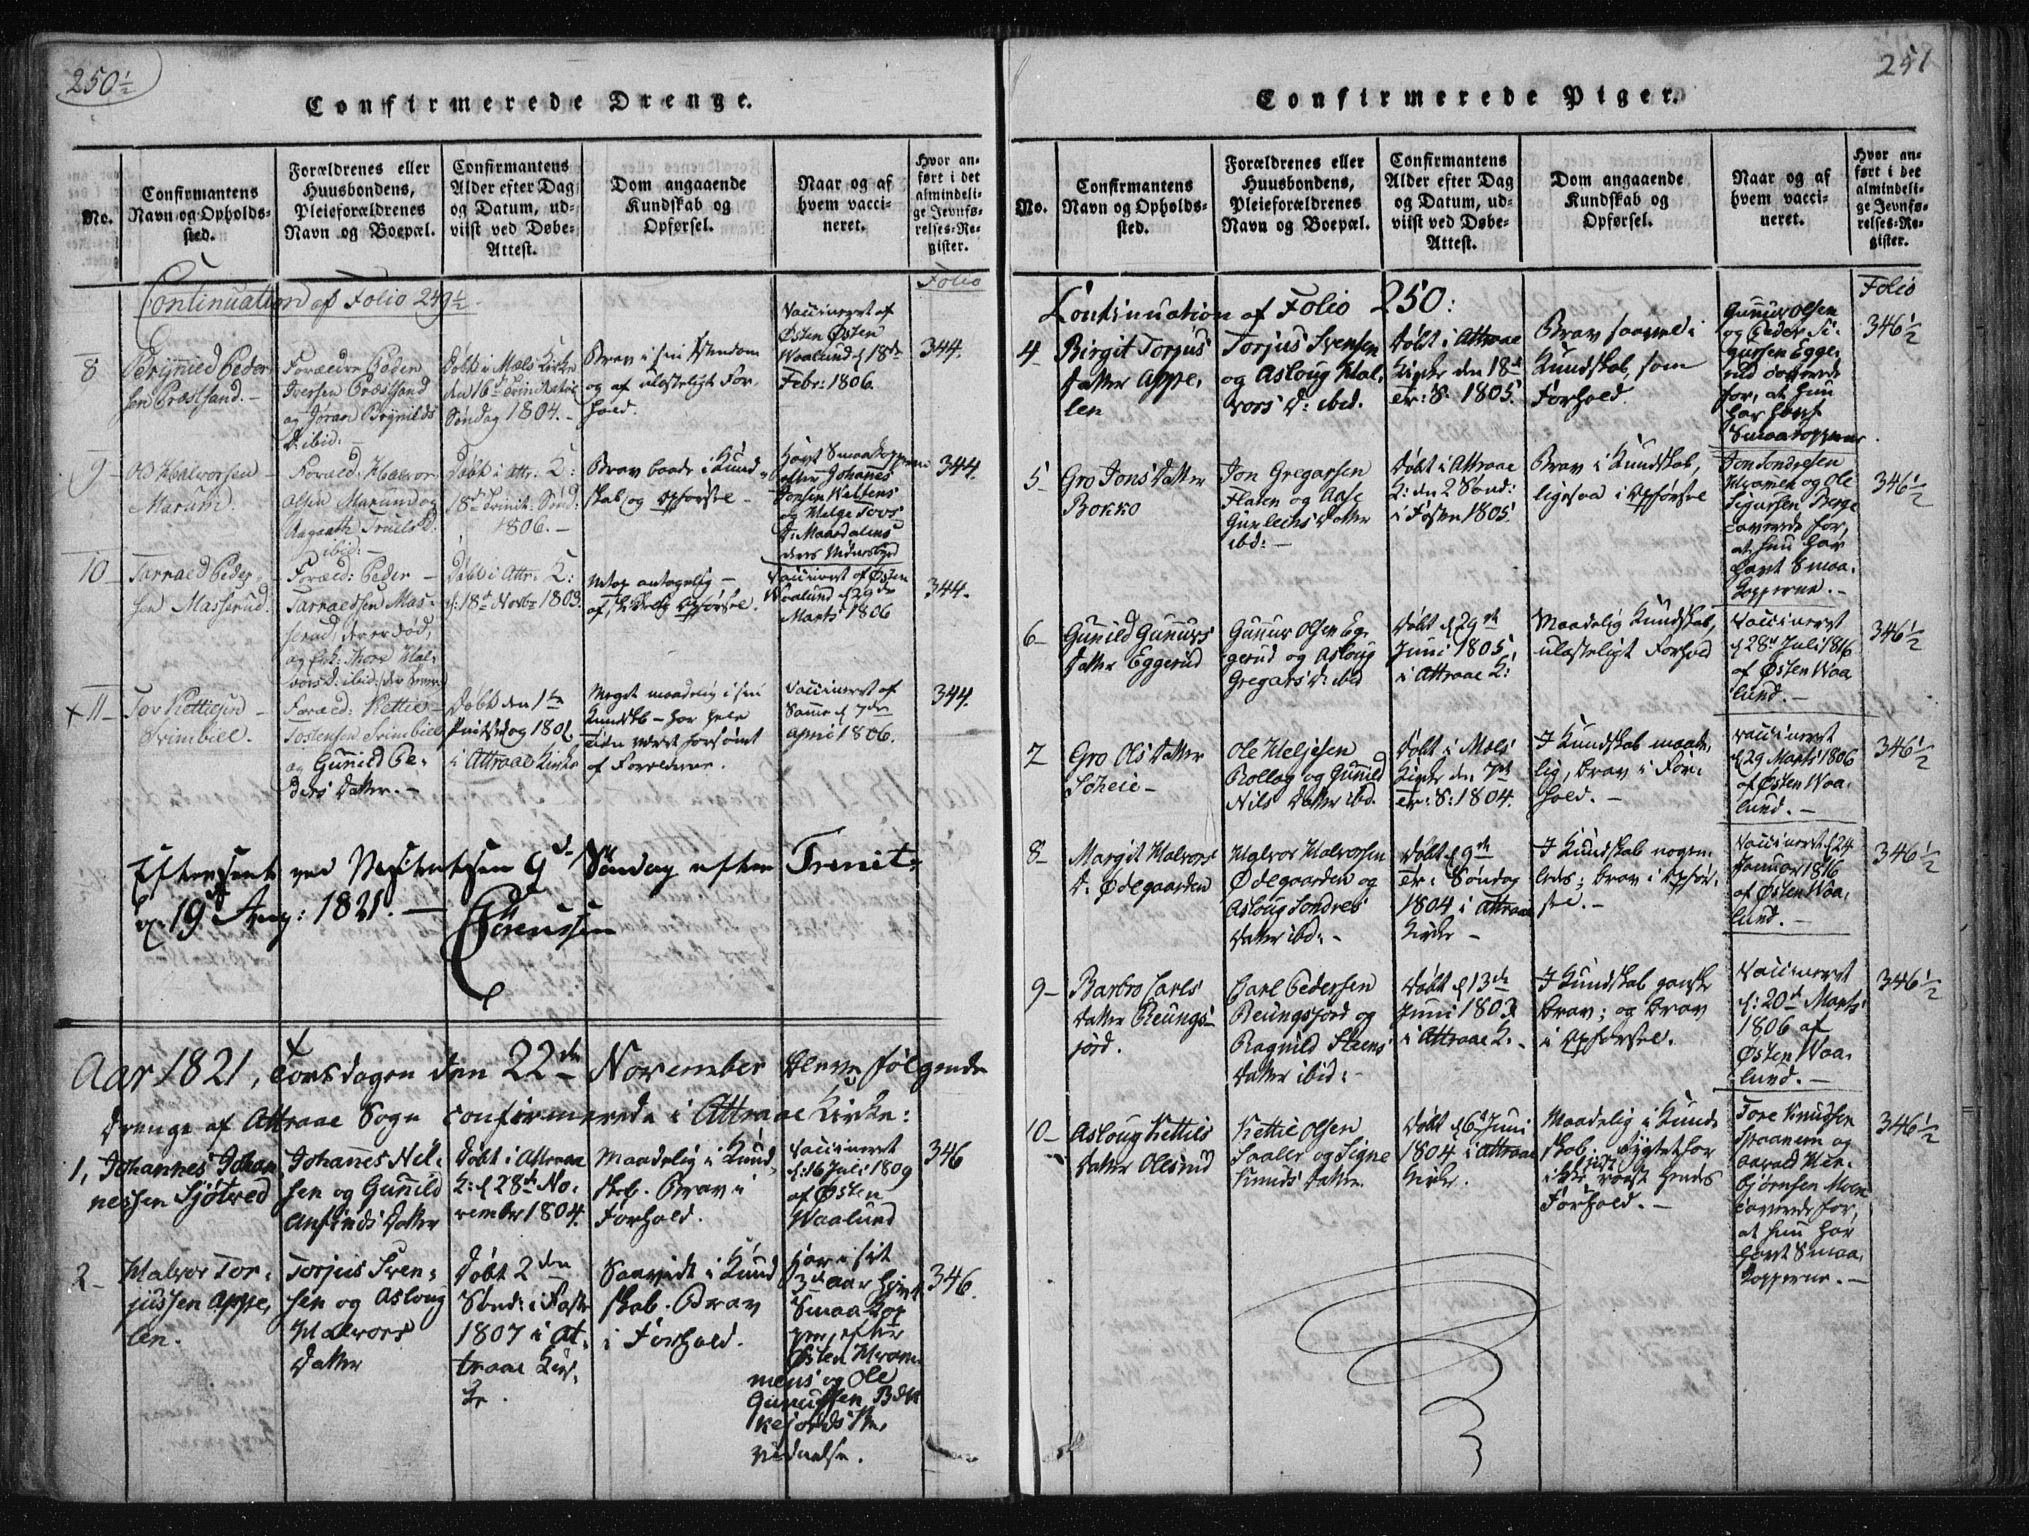 SAKO, Tinn kirkebøker, F/Fa/L0004: Ministerialbok nr. I 4, 1815-1843, s. 251